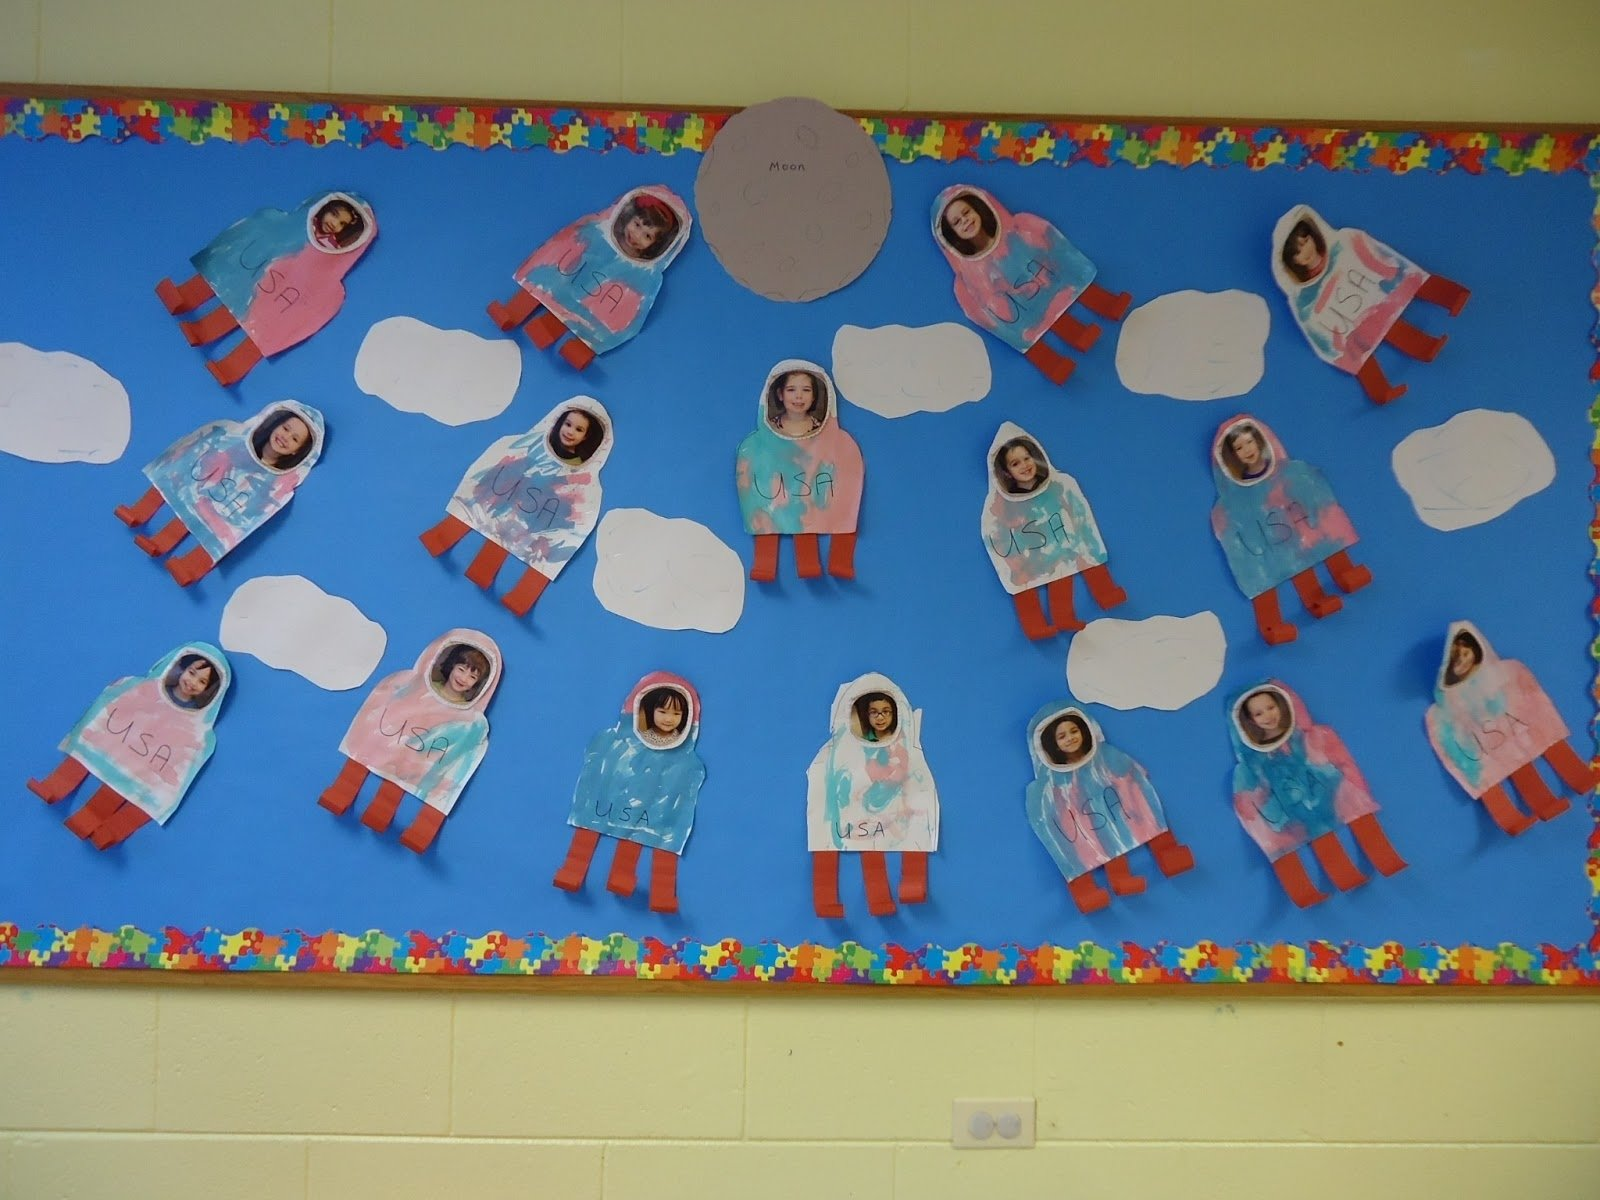 10 Stylish Preschool March Bulletin Board Ideas trinity preschool mount prospect space bulletin board and other 1 2020